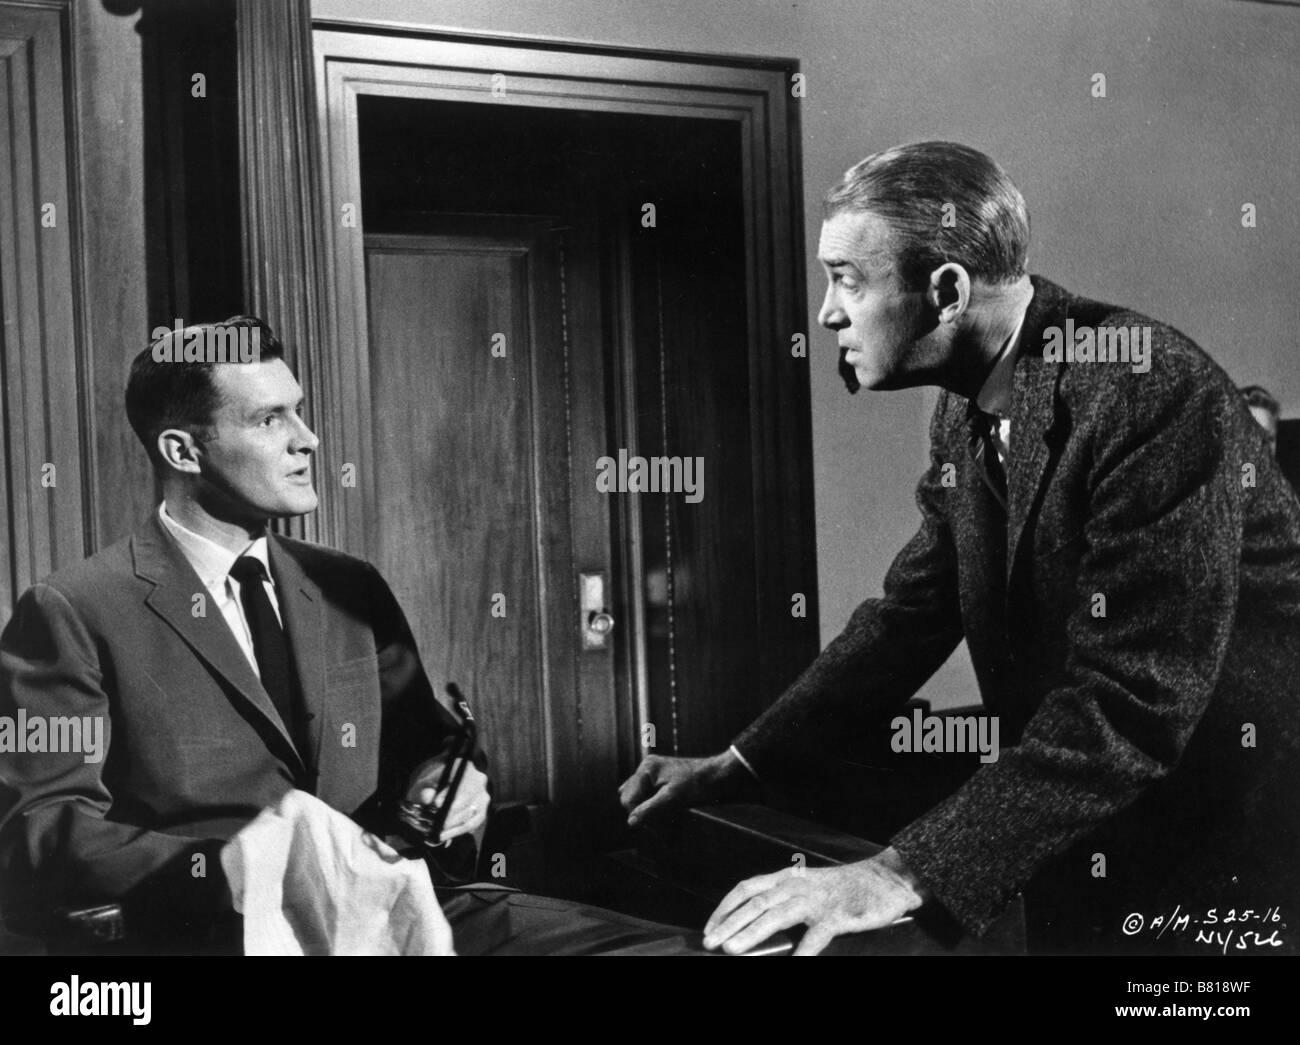 Anatomy Of A Murder 1959 James Stewart Stock Photos & Anatomy Of A ...